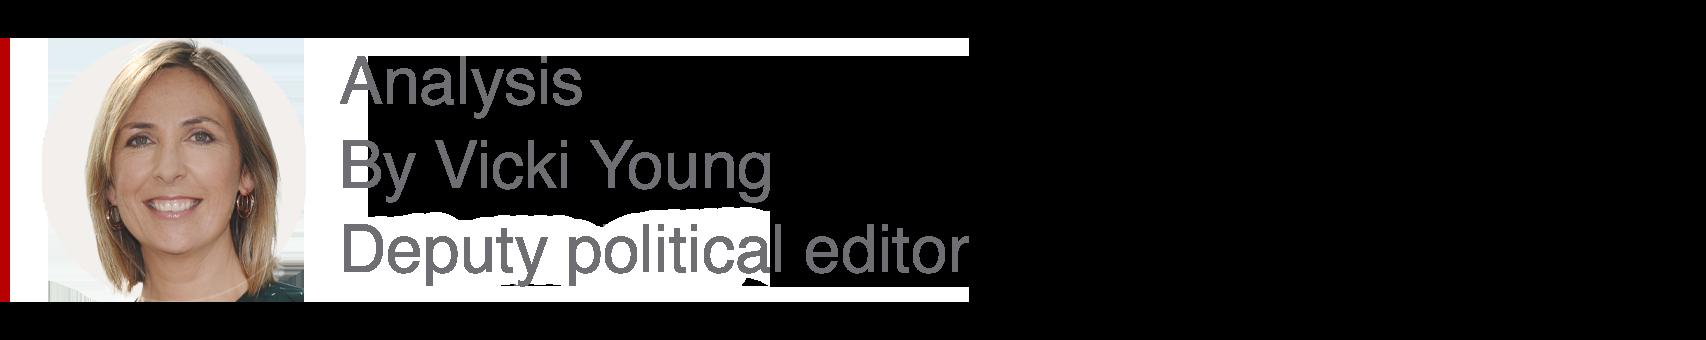 Analysis box by Vicki Young, deputy political editor